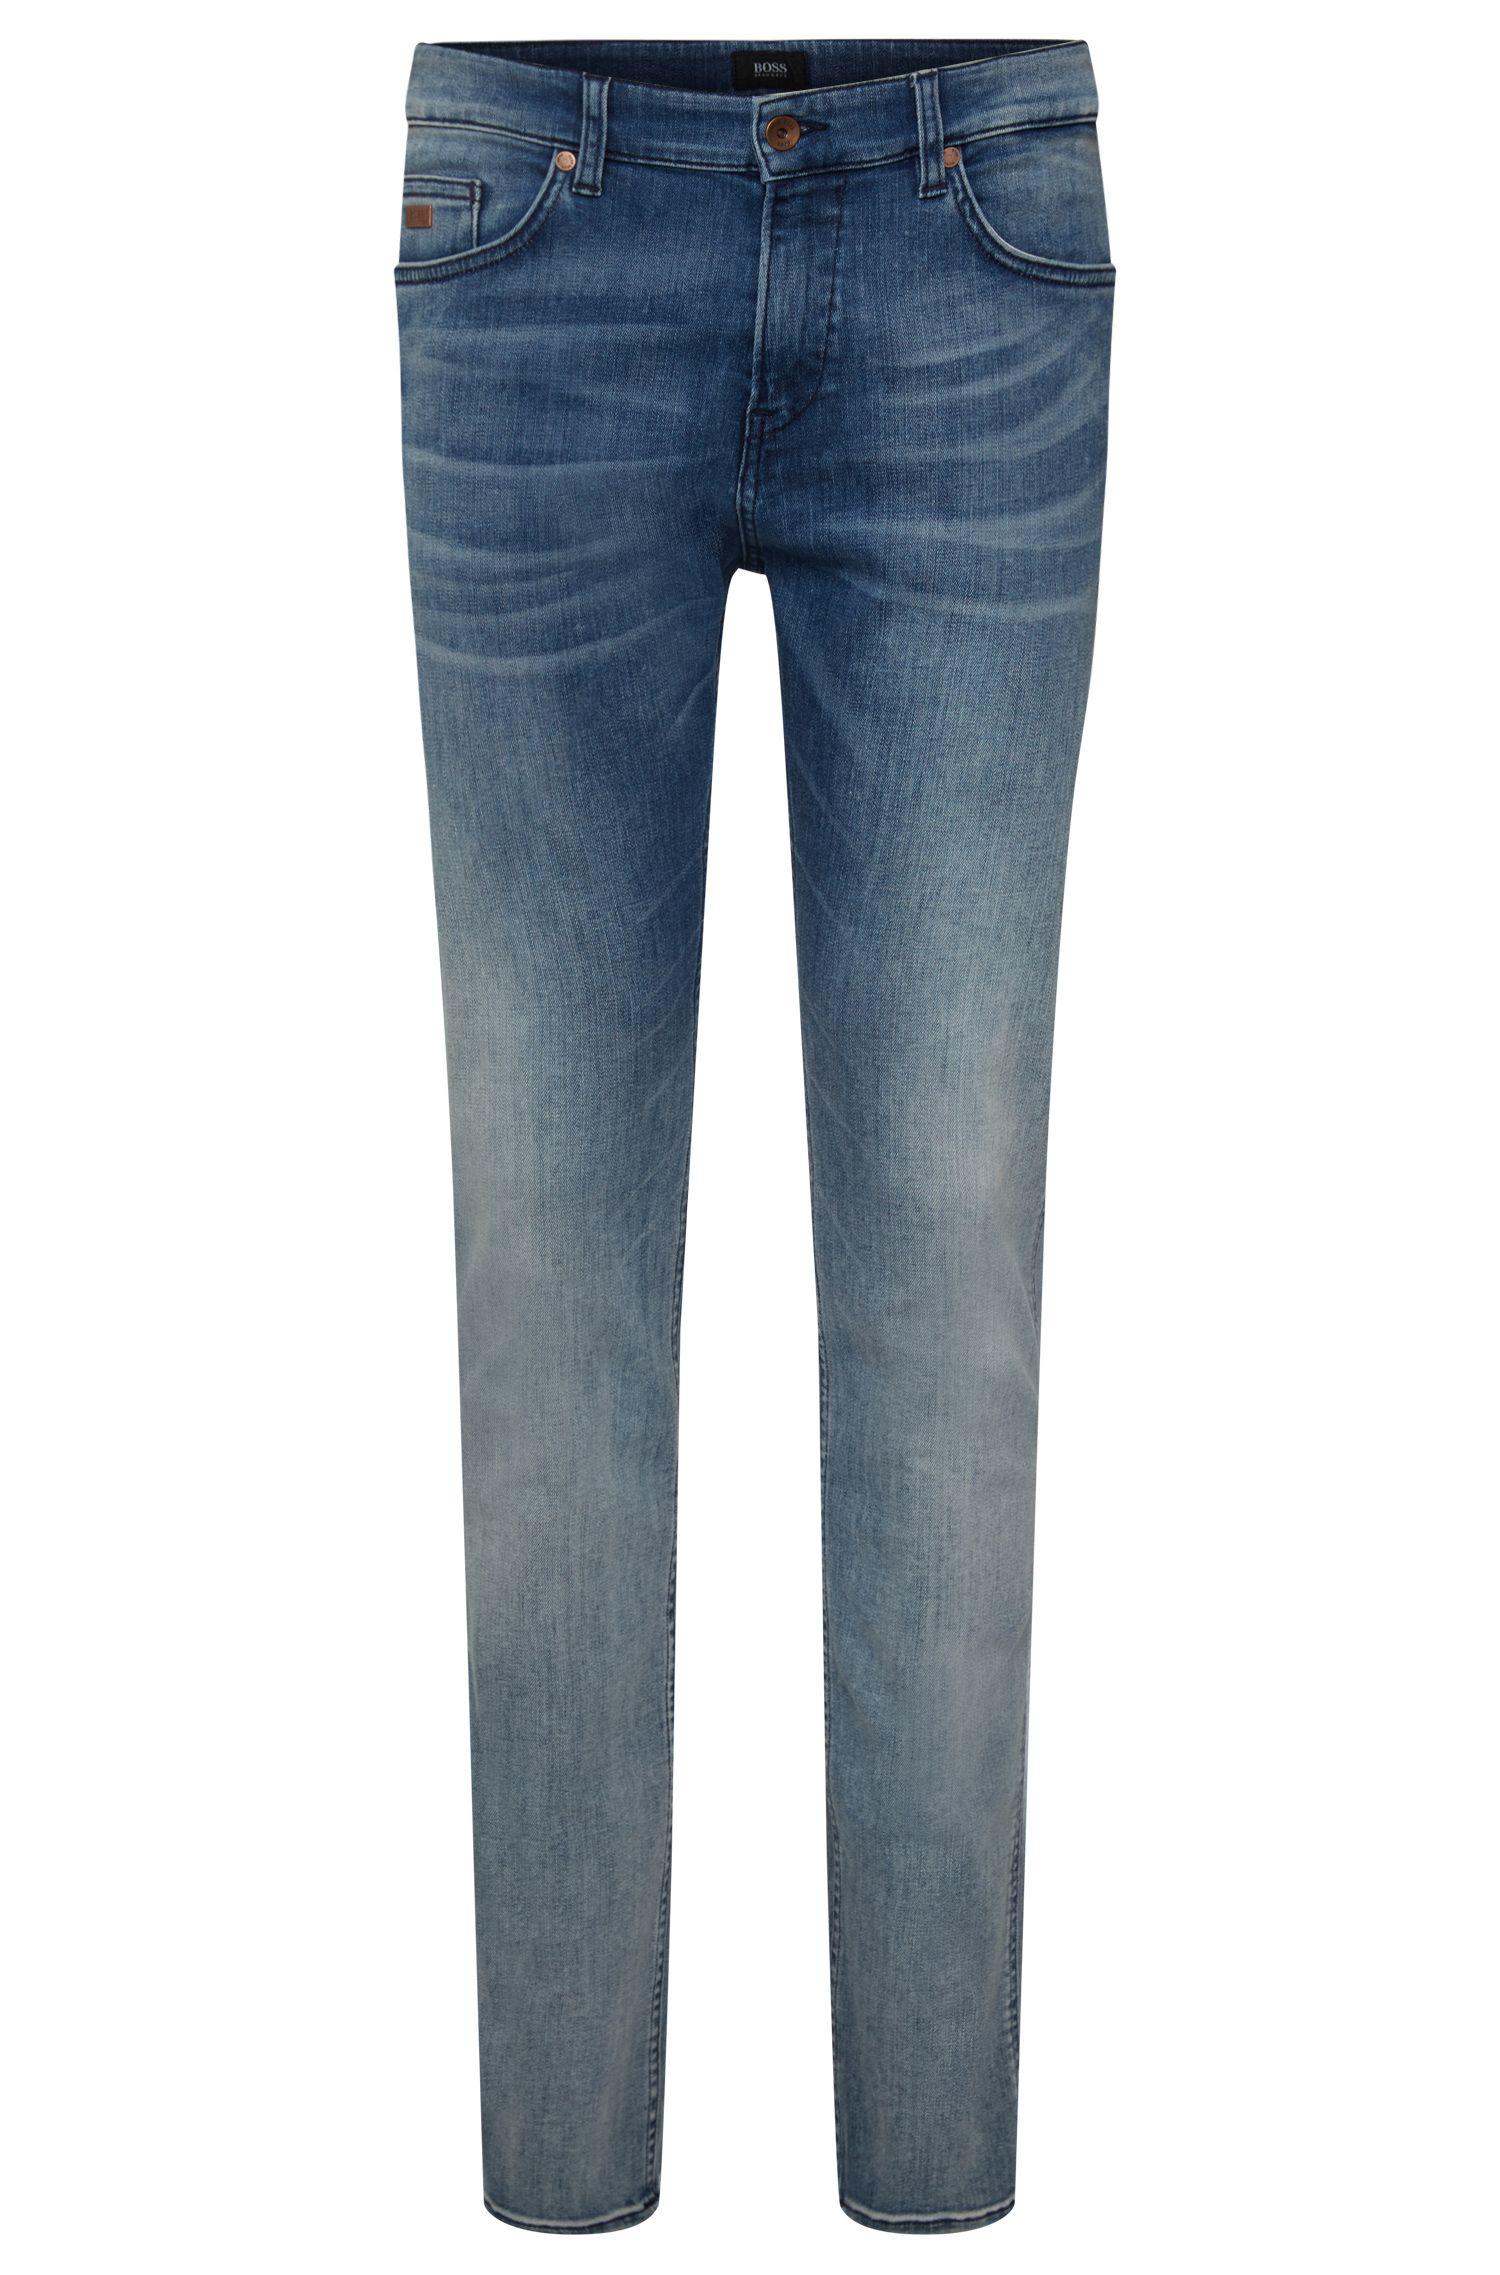 'Delaware' | Slim Fit, 11 oz Stretch Cotton Jeans